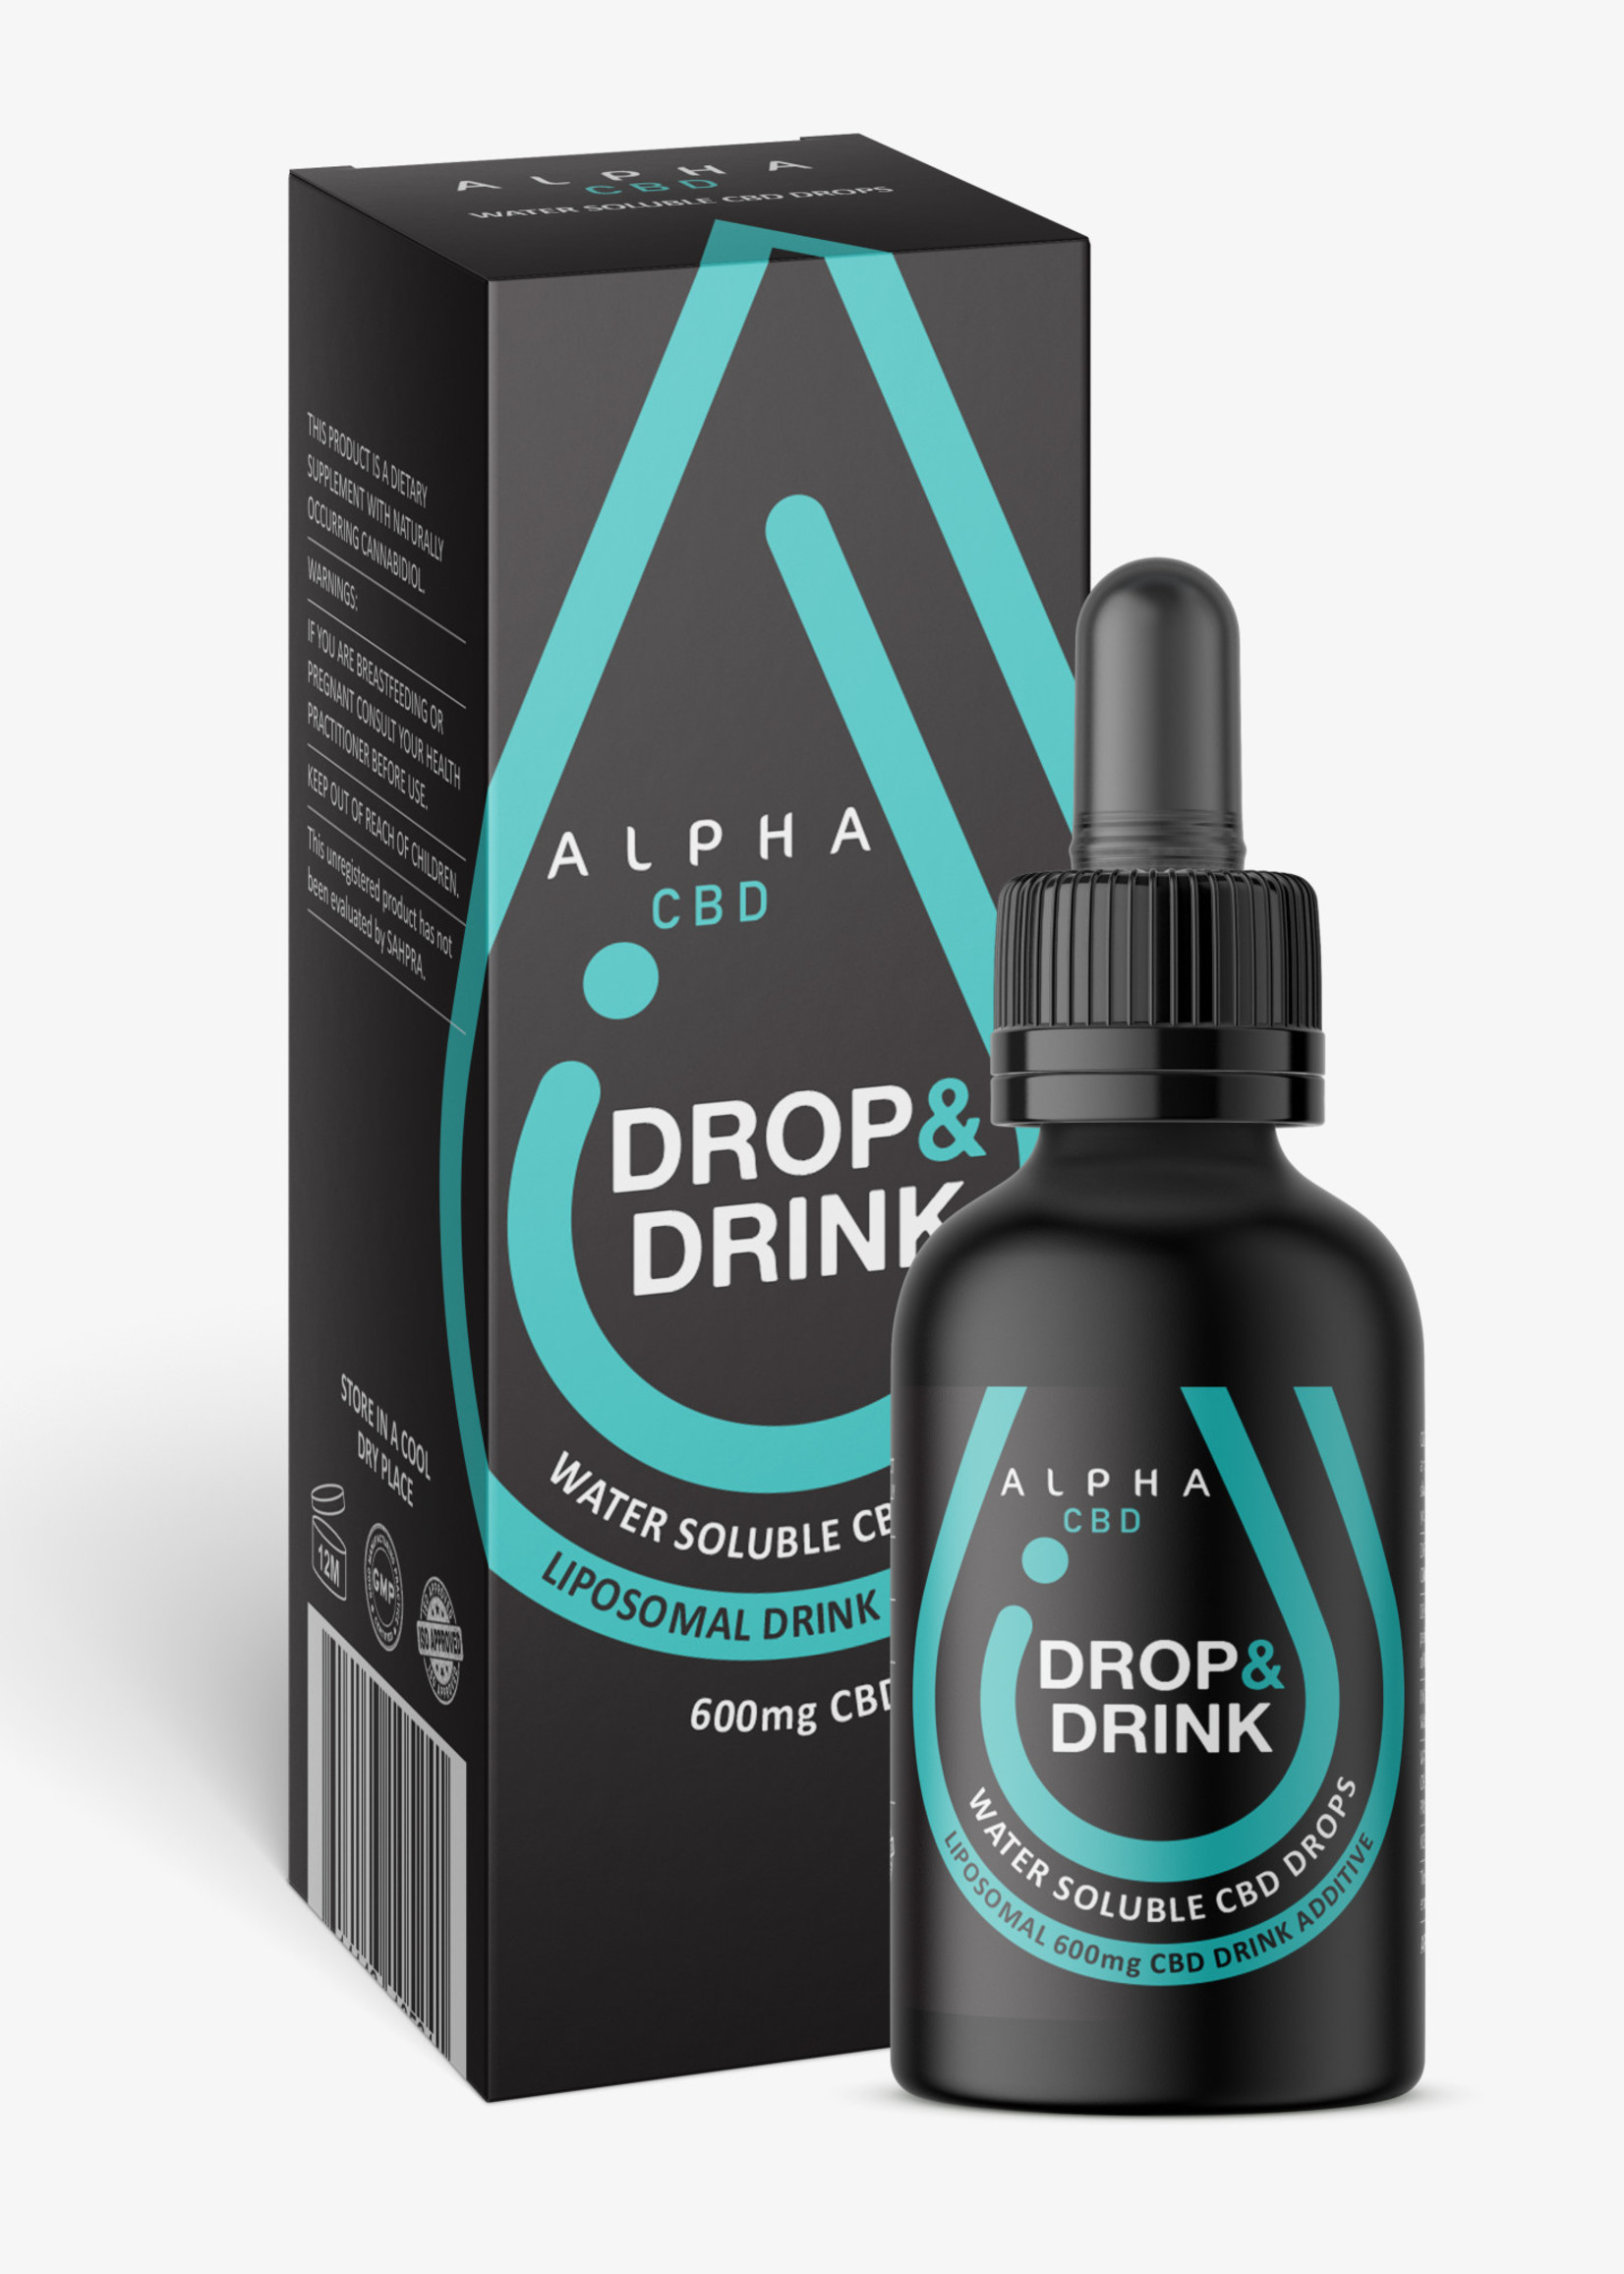 Alpha CBD - Drop & drink